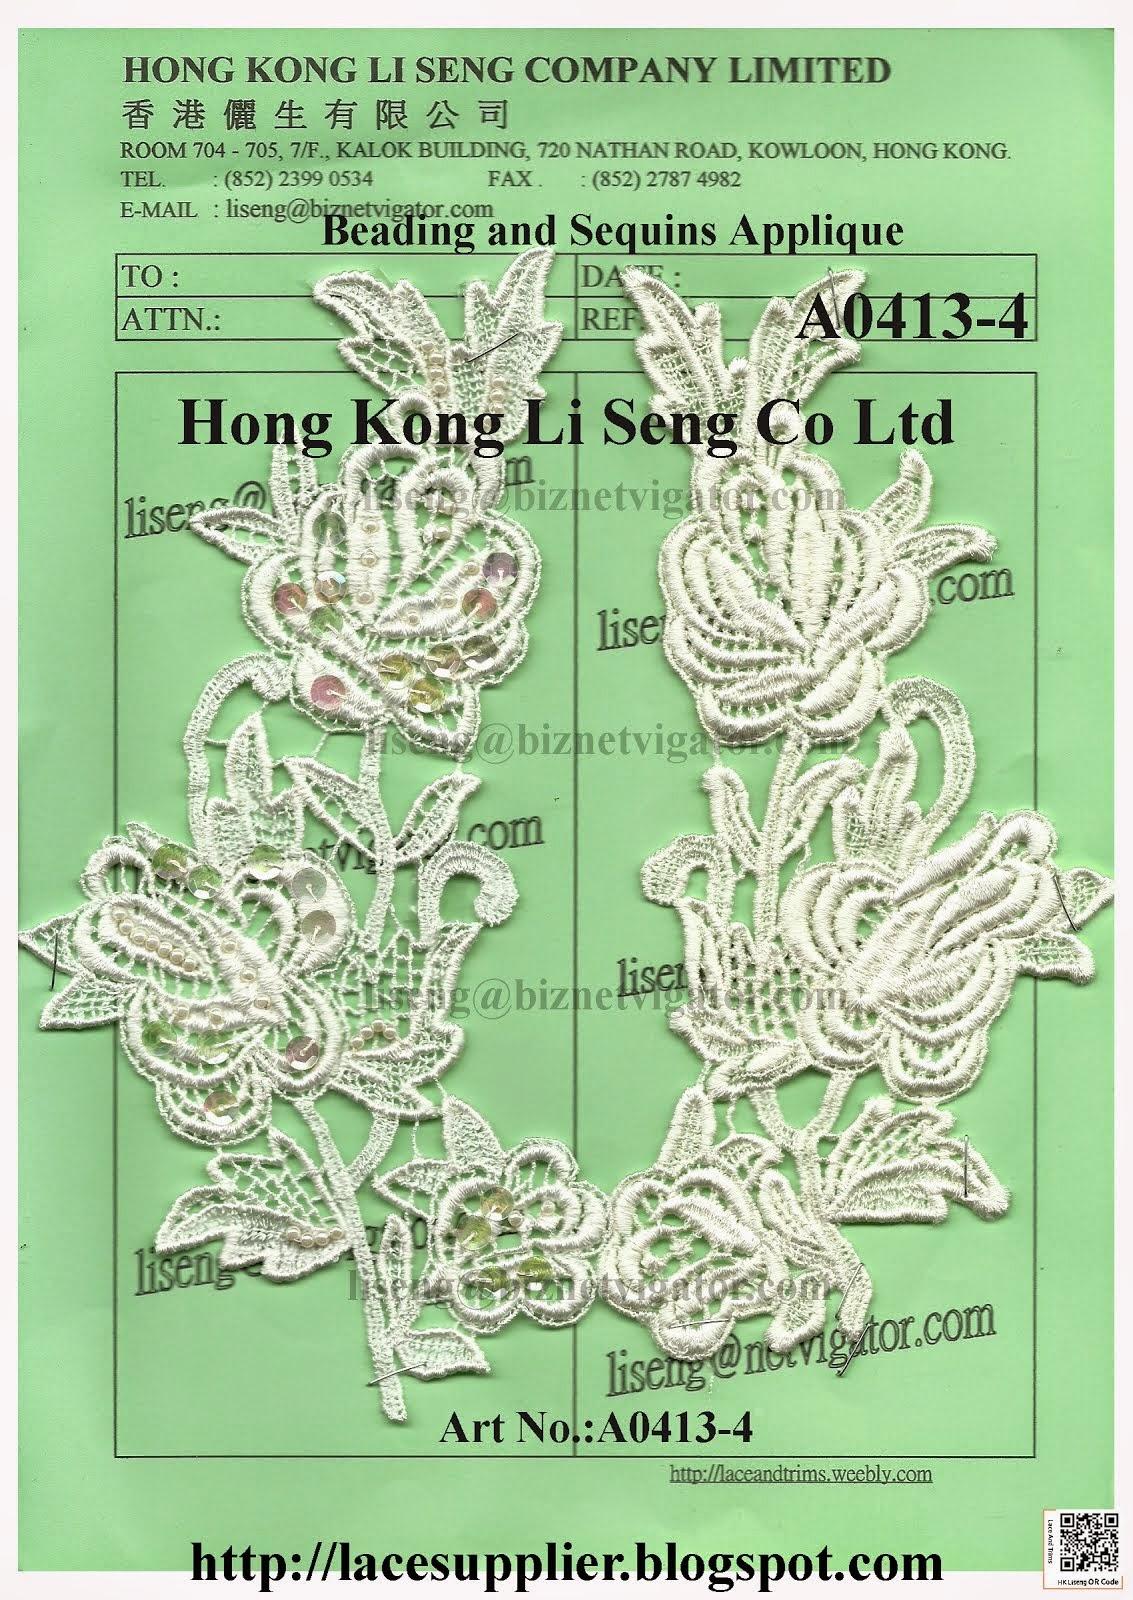 Beading and Sequins Applique Manufacturer Wholesale Supplier - Hong Kong Li Seng Co Ltd